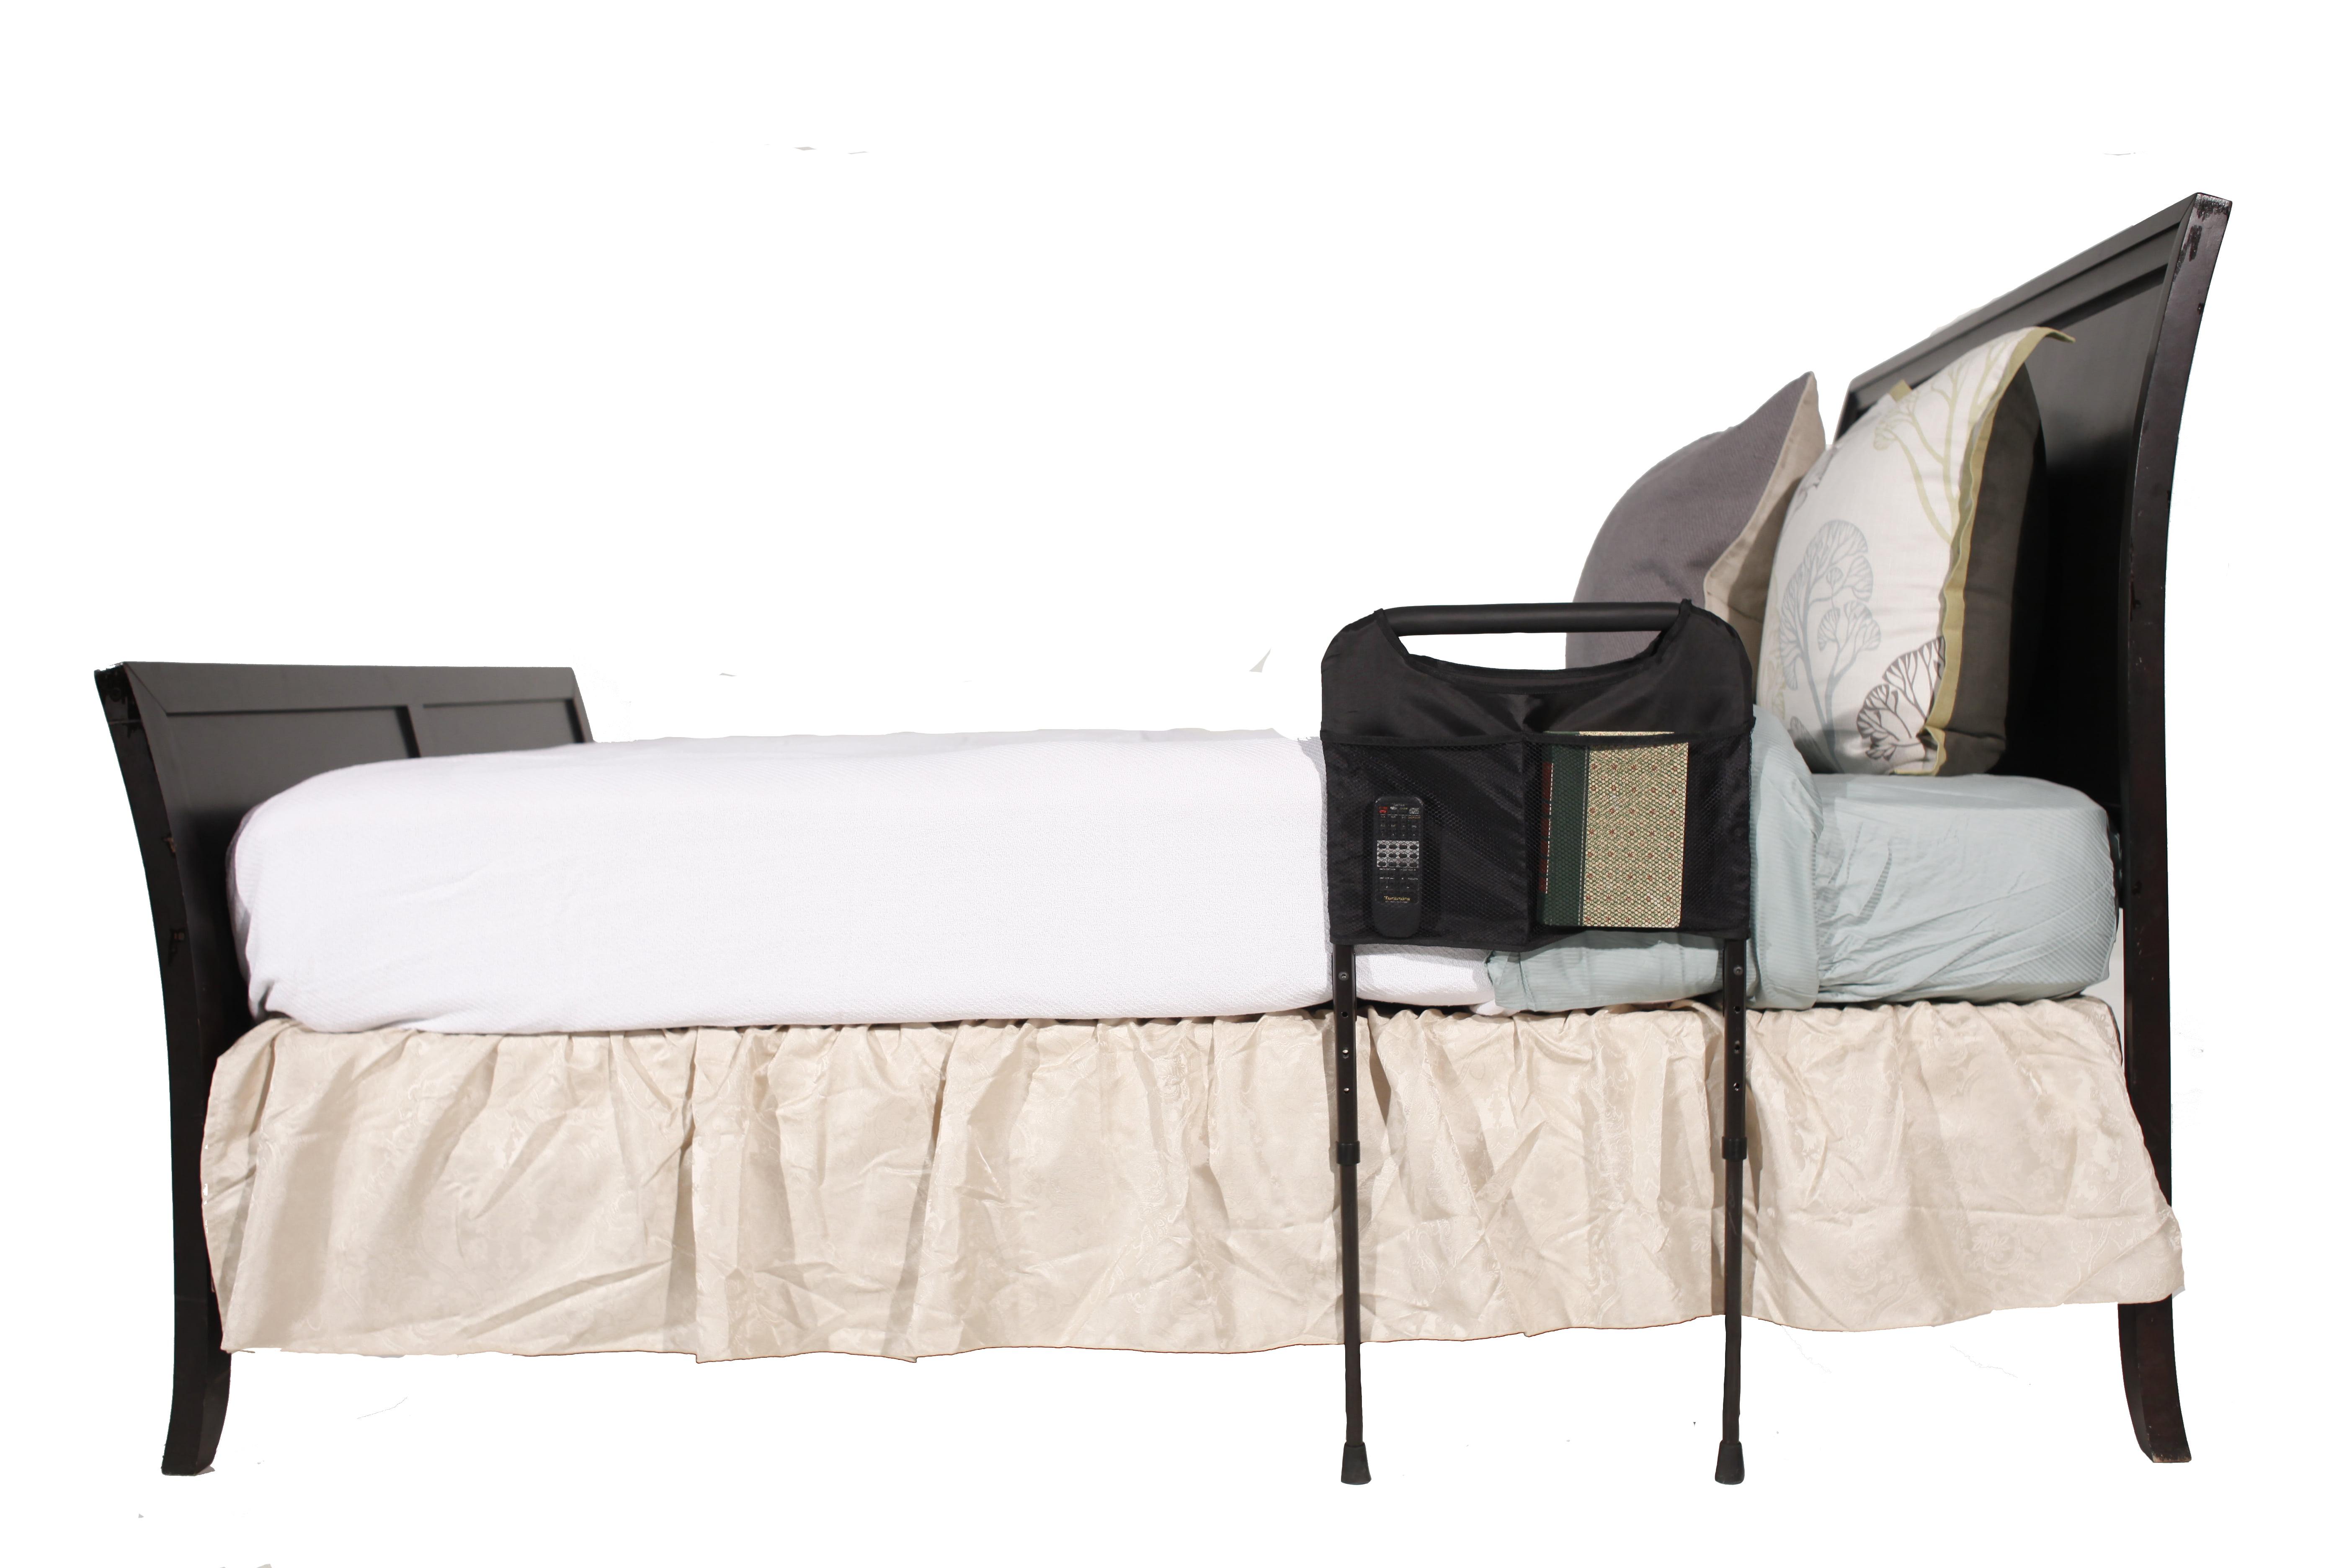 frame headboard for king leirsund sale base size white with ikea of platform elderly frames bed metal full rails